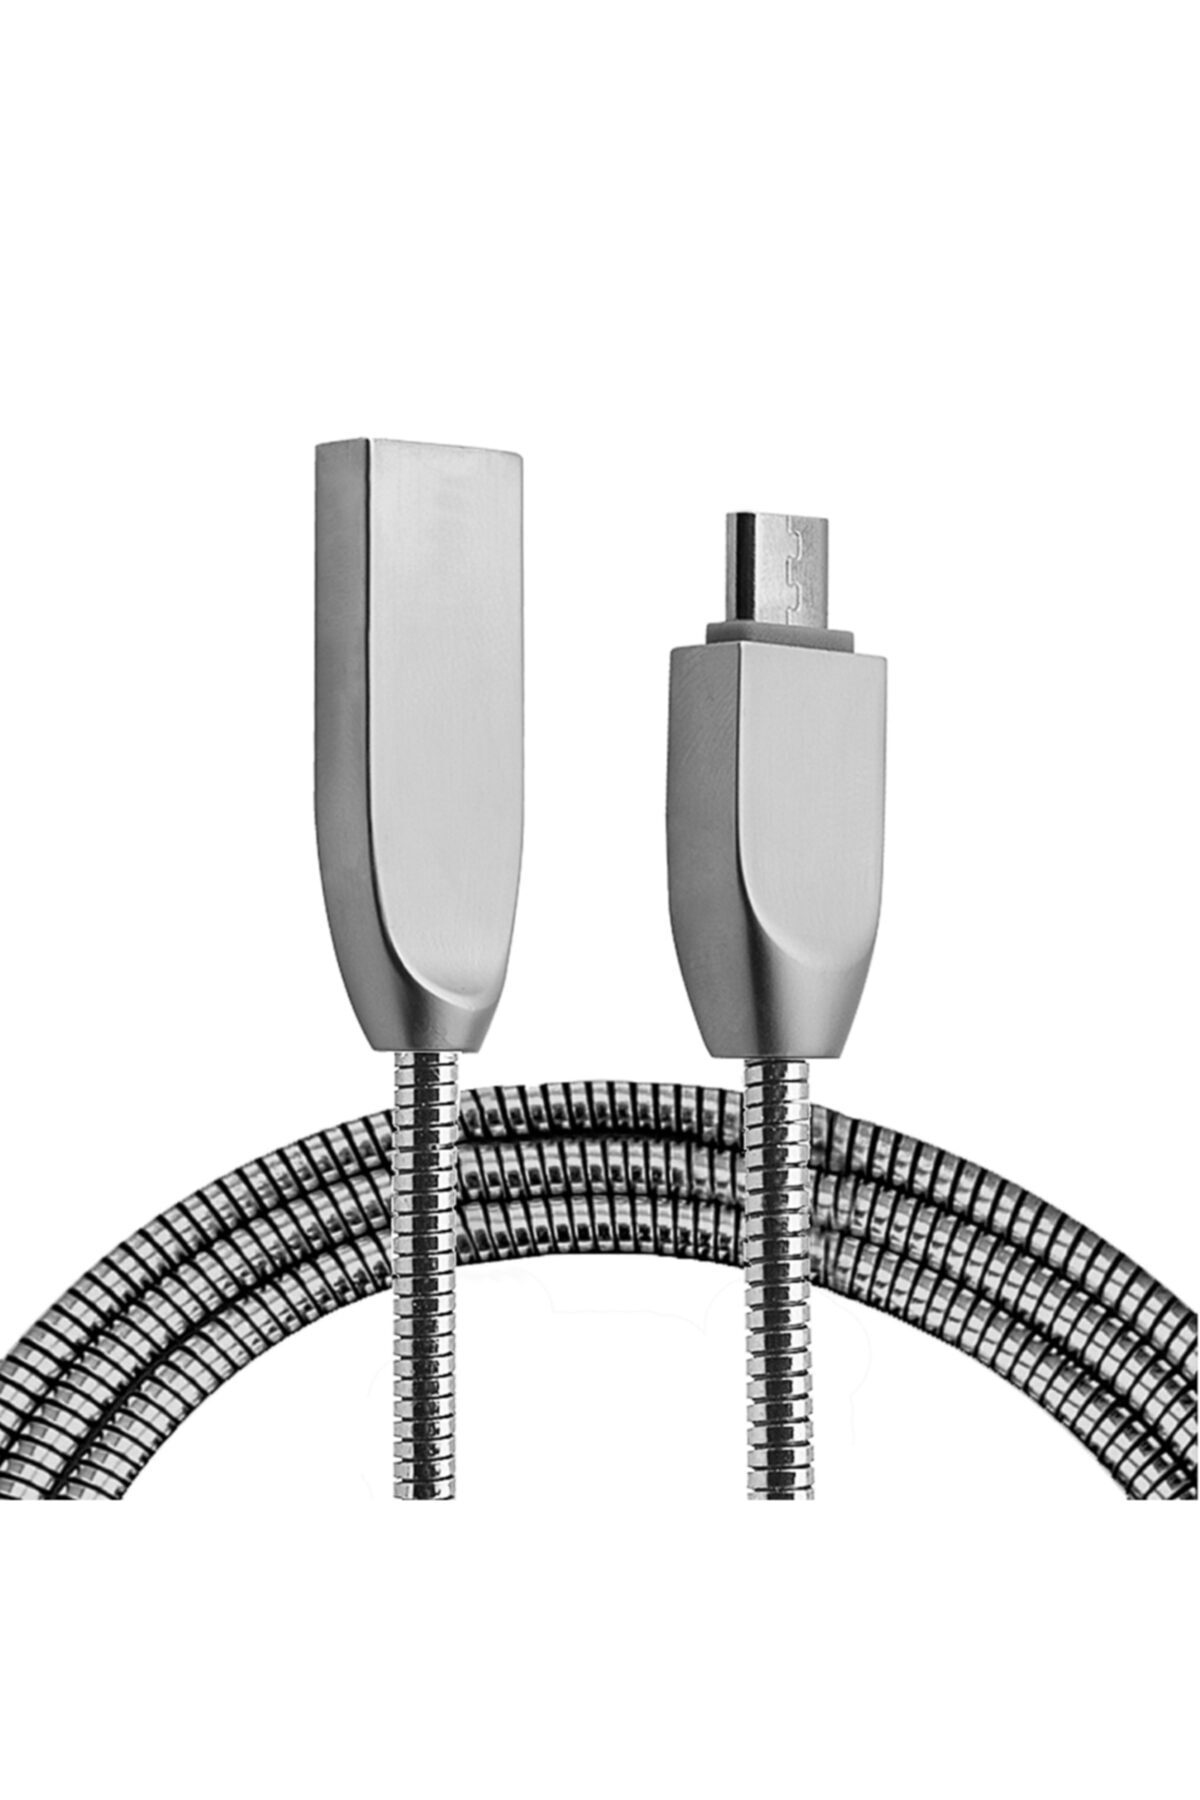 Ally Mobile Ally Micro Usb Zinc Alloy Dayanıklı 2,4 A Metal 1mm Usb Kablo 1